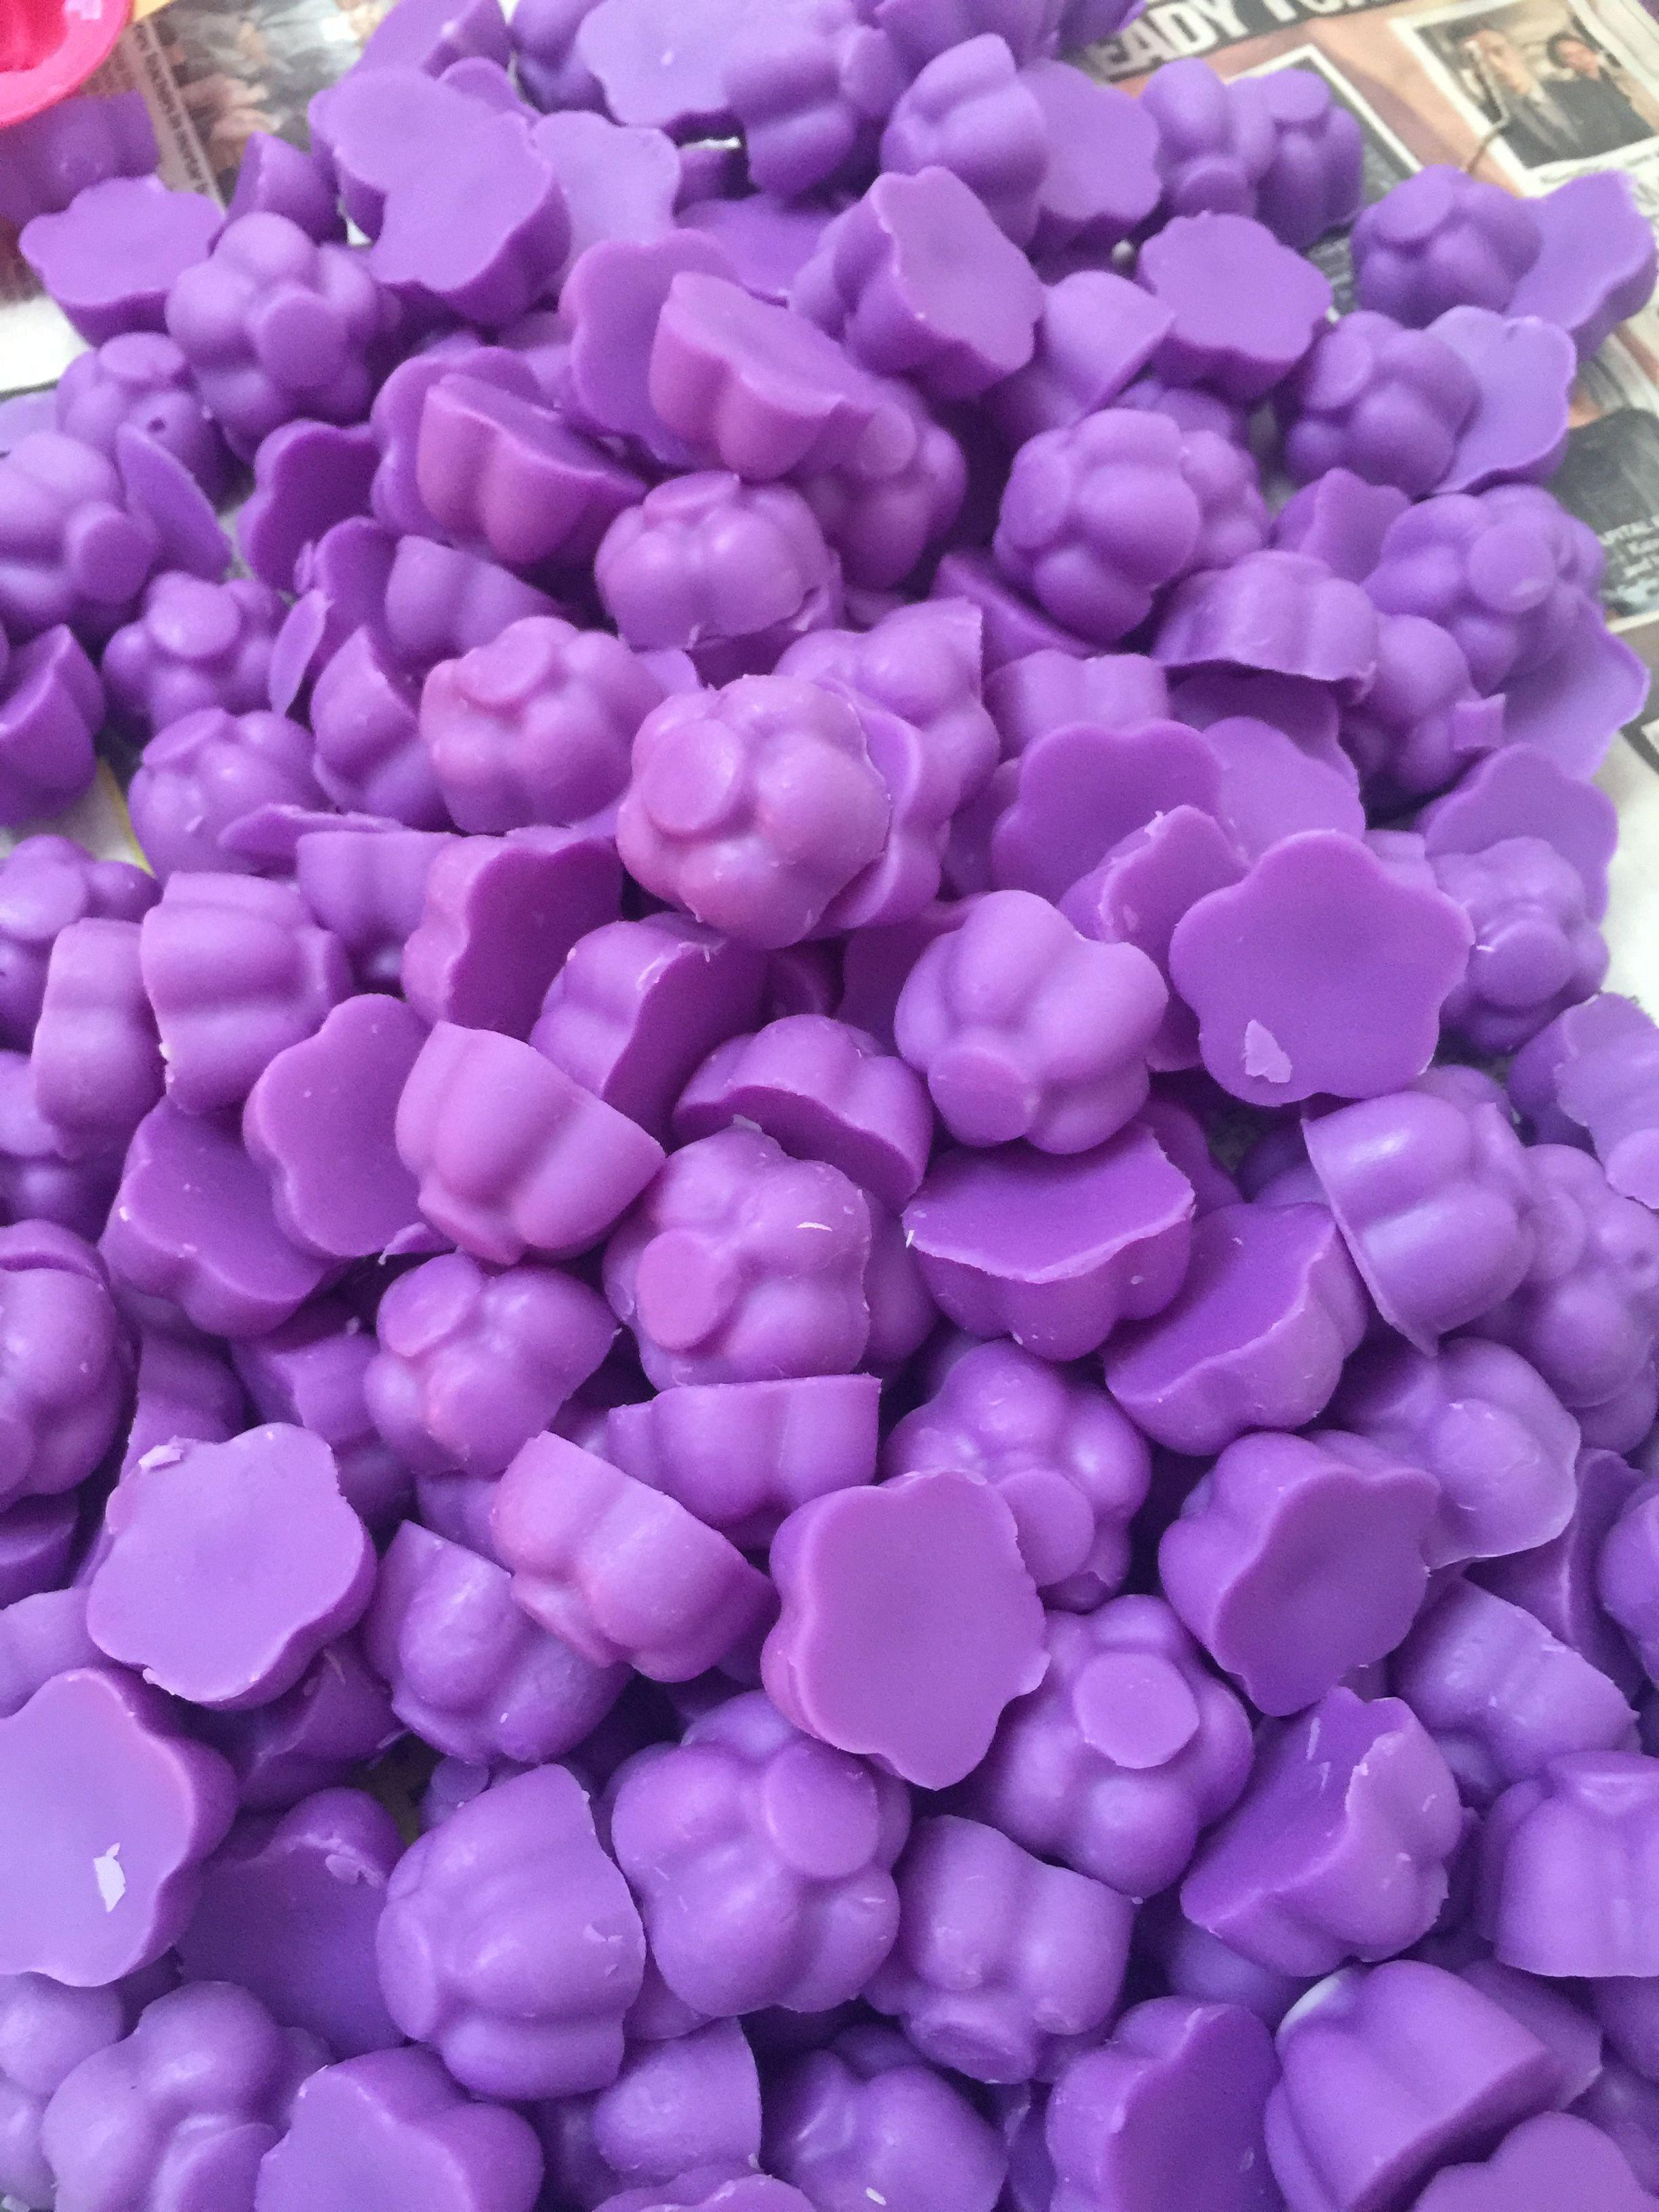 Palma violet daisy wax melts www.daisymelts.co.uk Wax